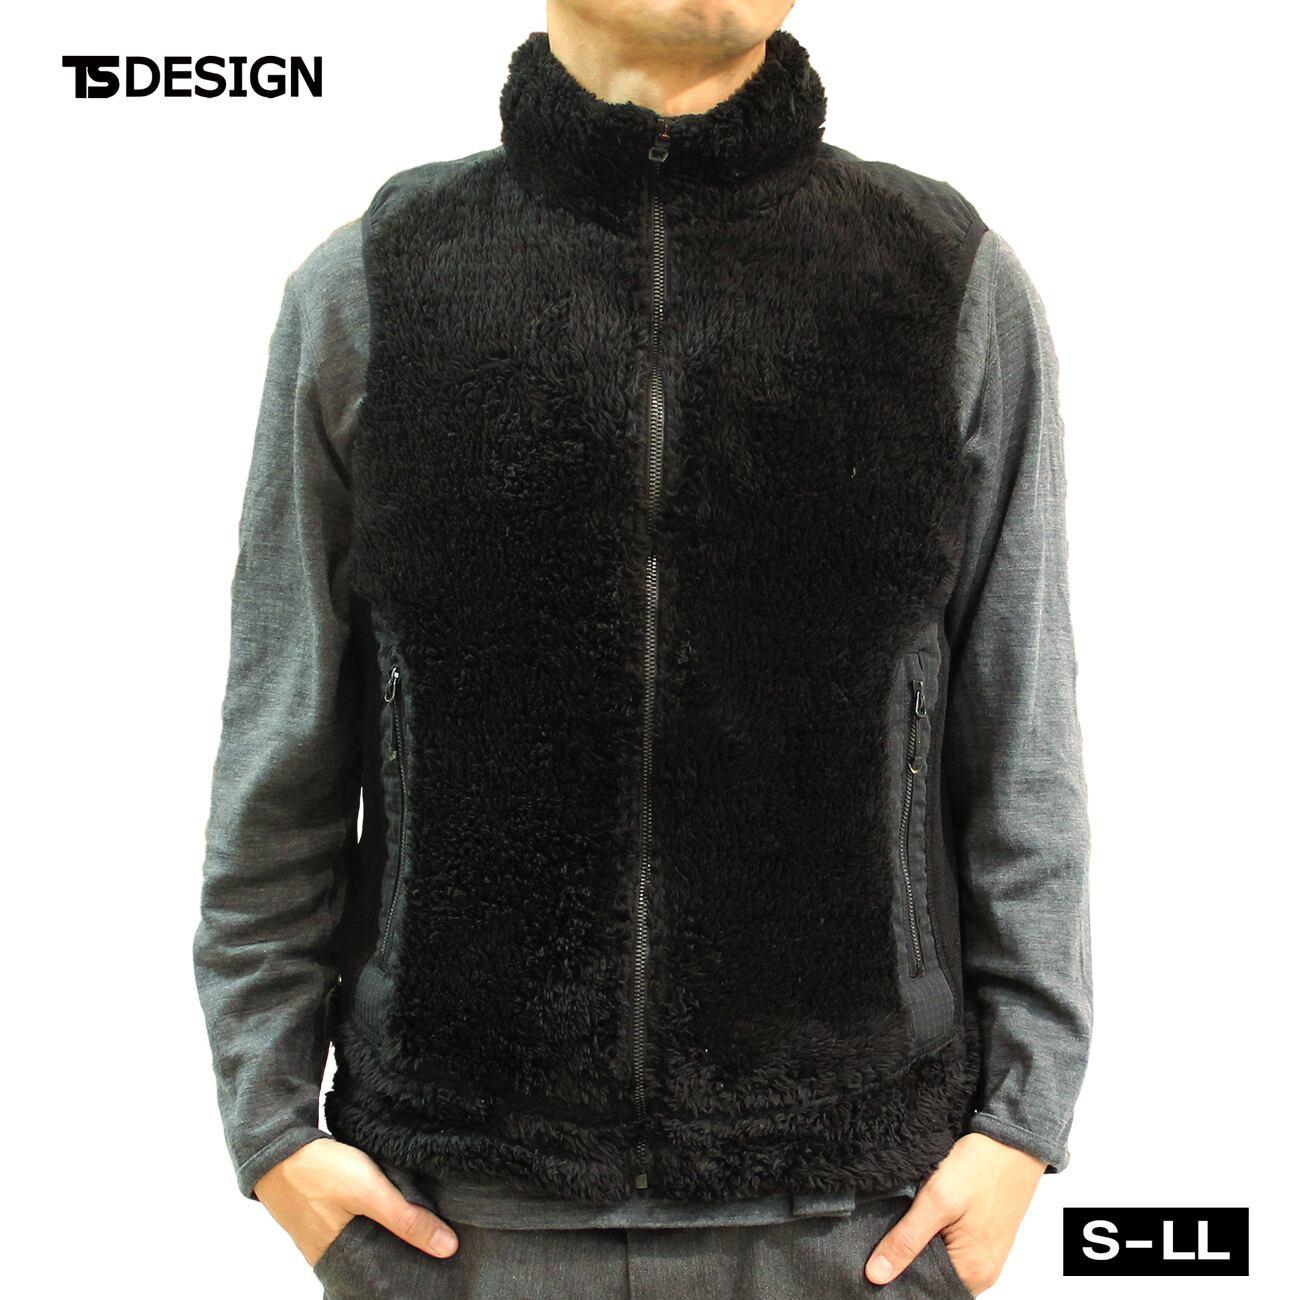 TS DESIGN TS DELTA  Bulky fleece Vest S-LL